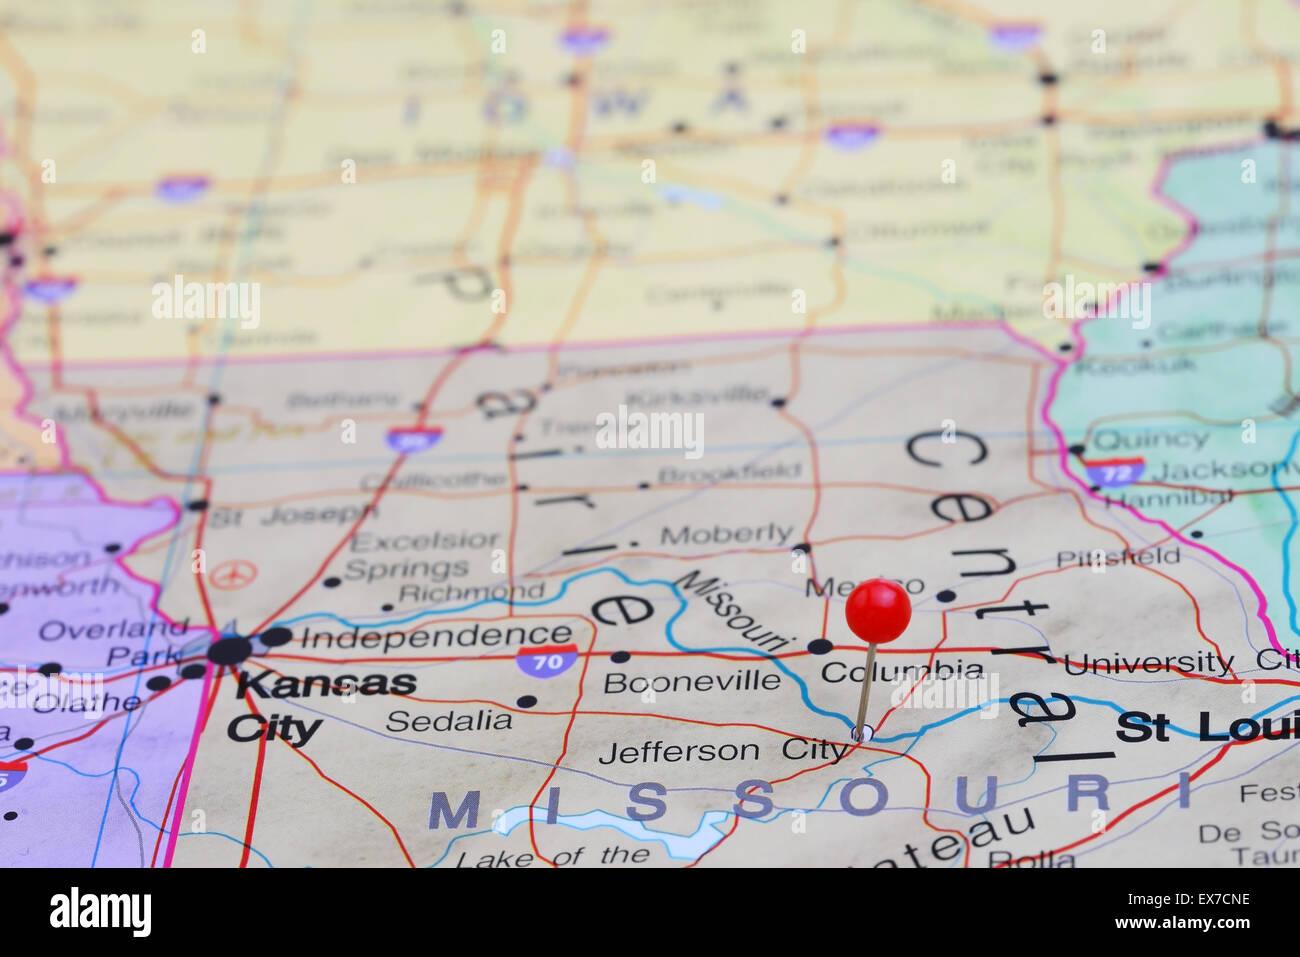 Jefferson City pinned on a map of USA Stock Photo: 84986202 - Alamy